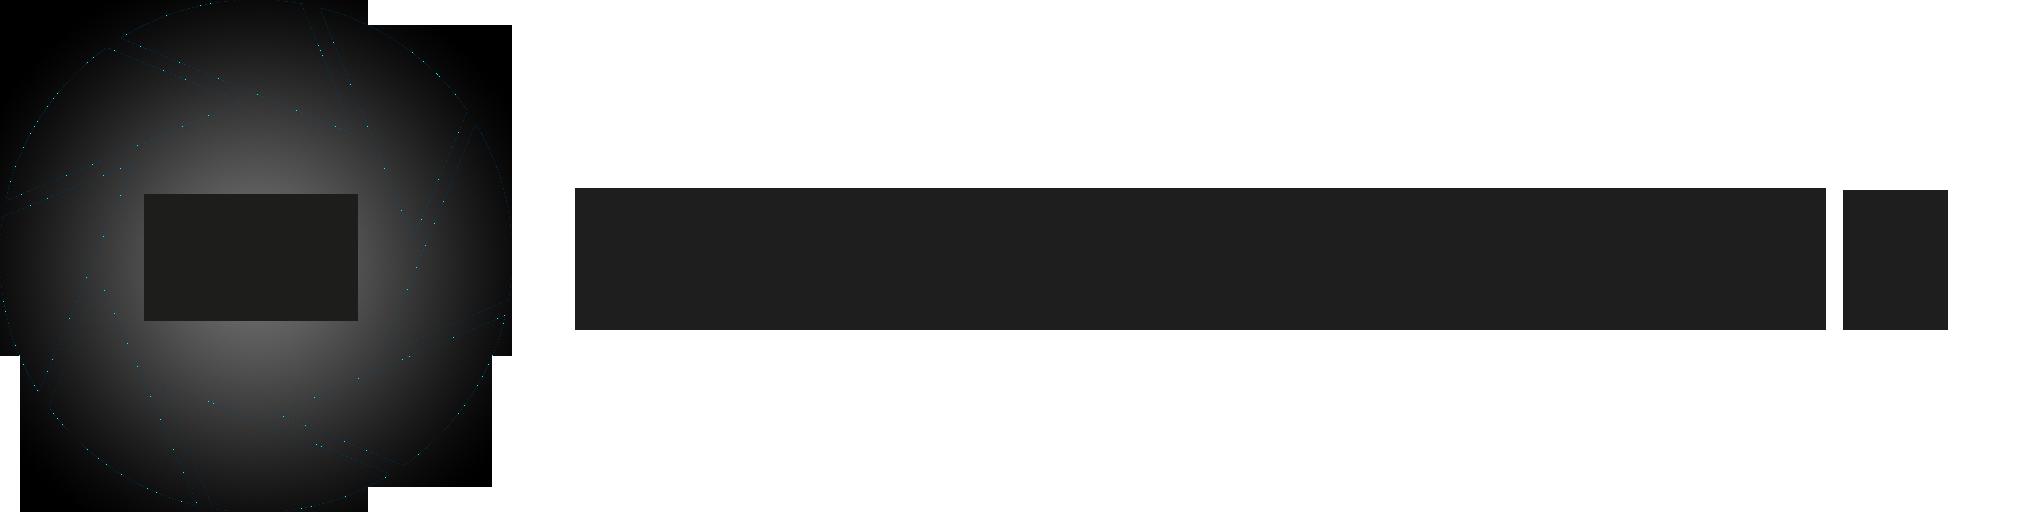 David Touitou